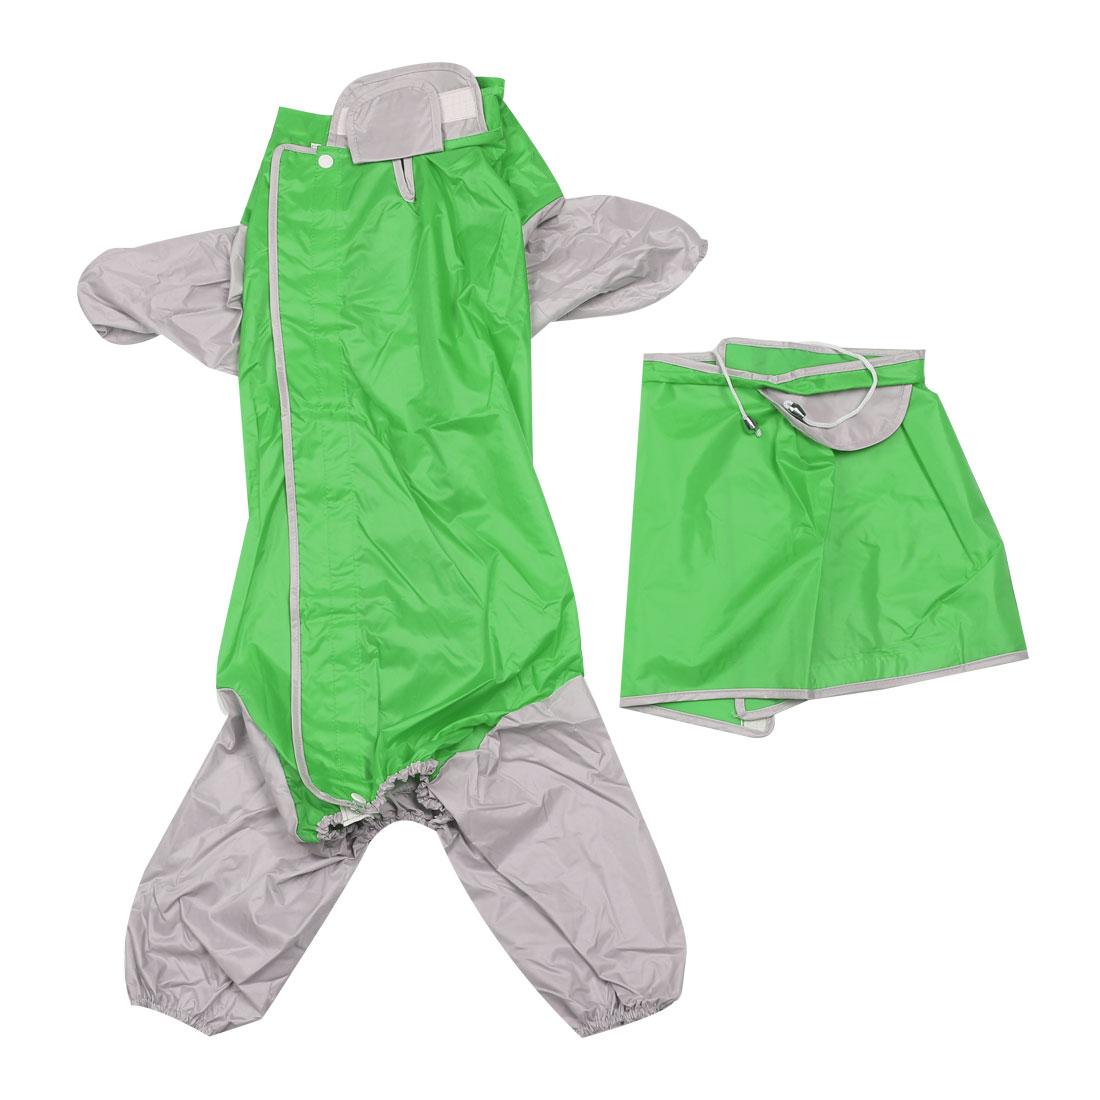 Pet Dog Raincoat Rain Jacket Poncho Clothes Dog Rainwears Green L